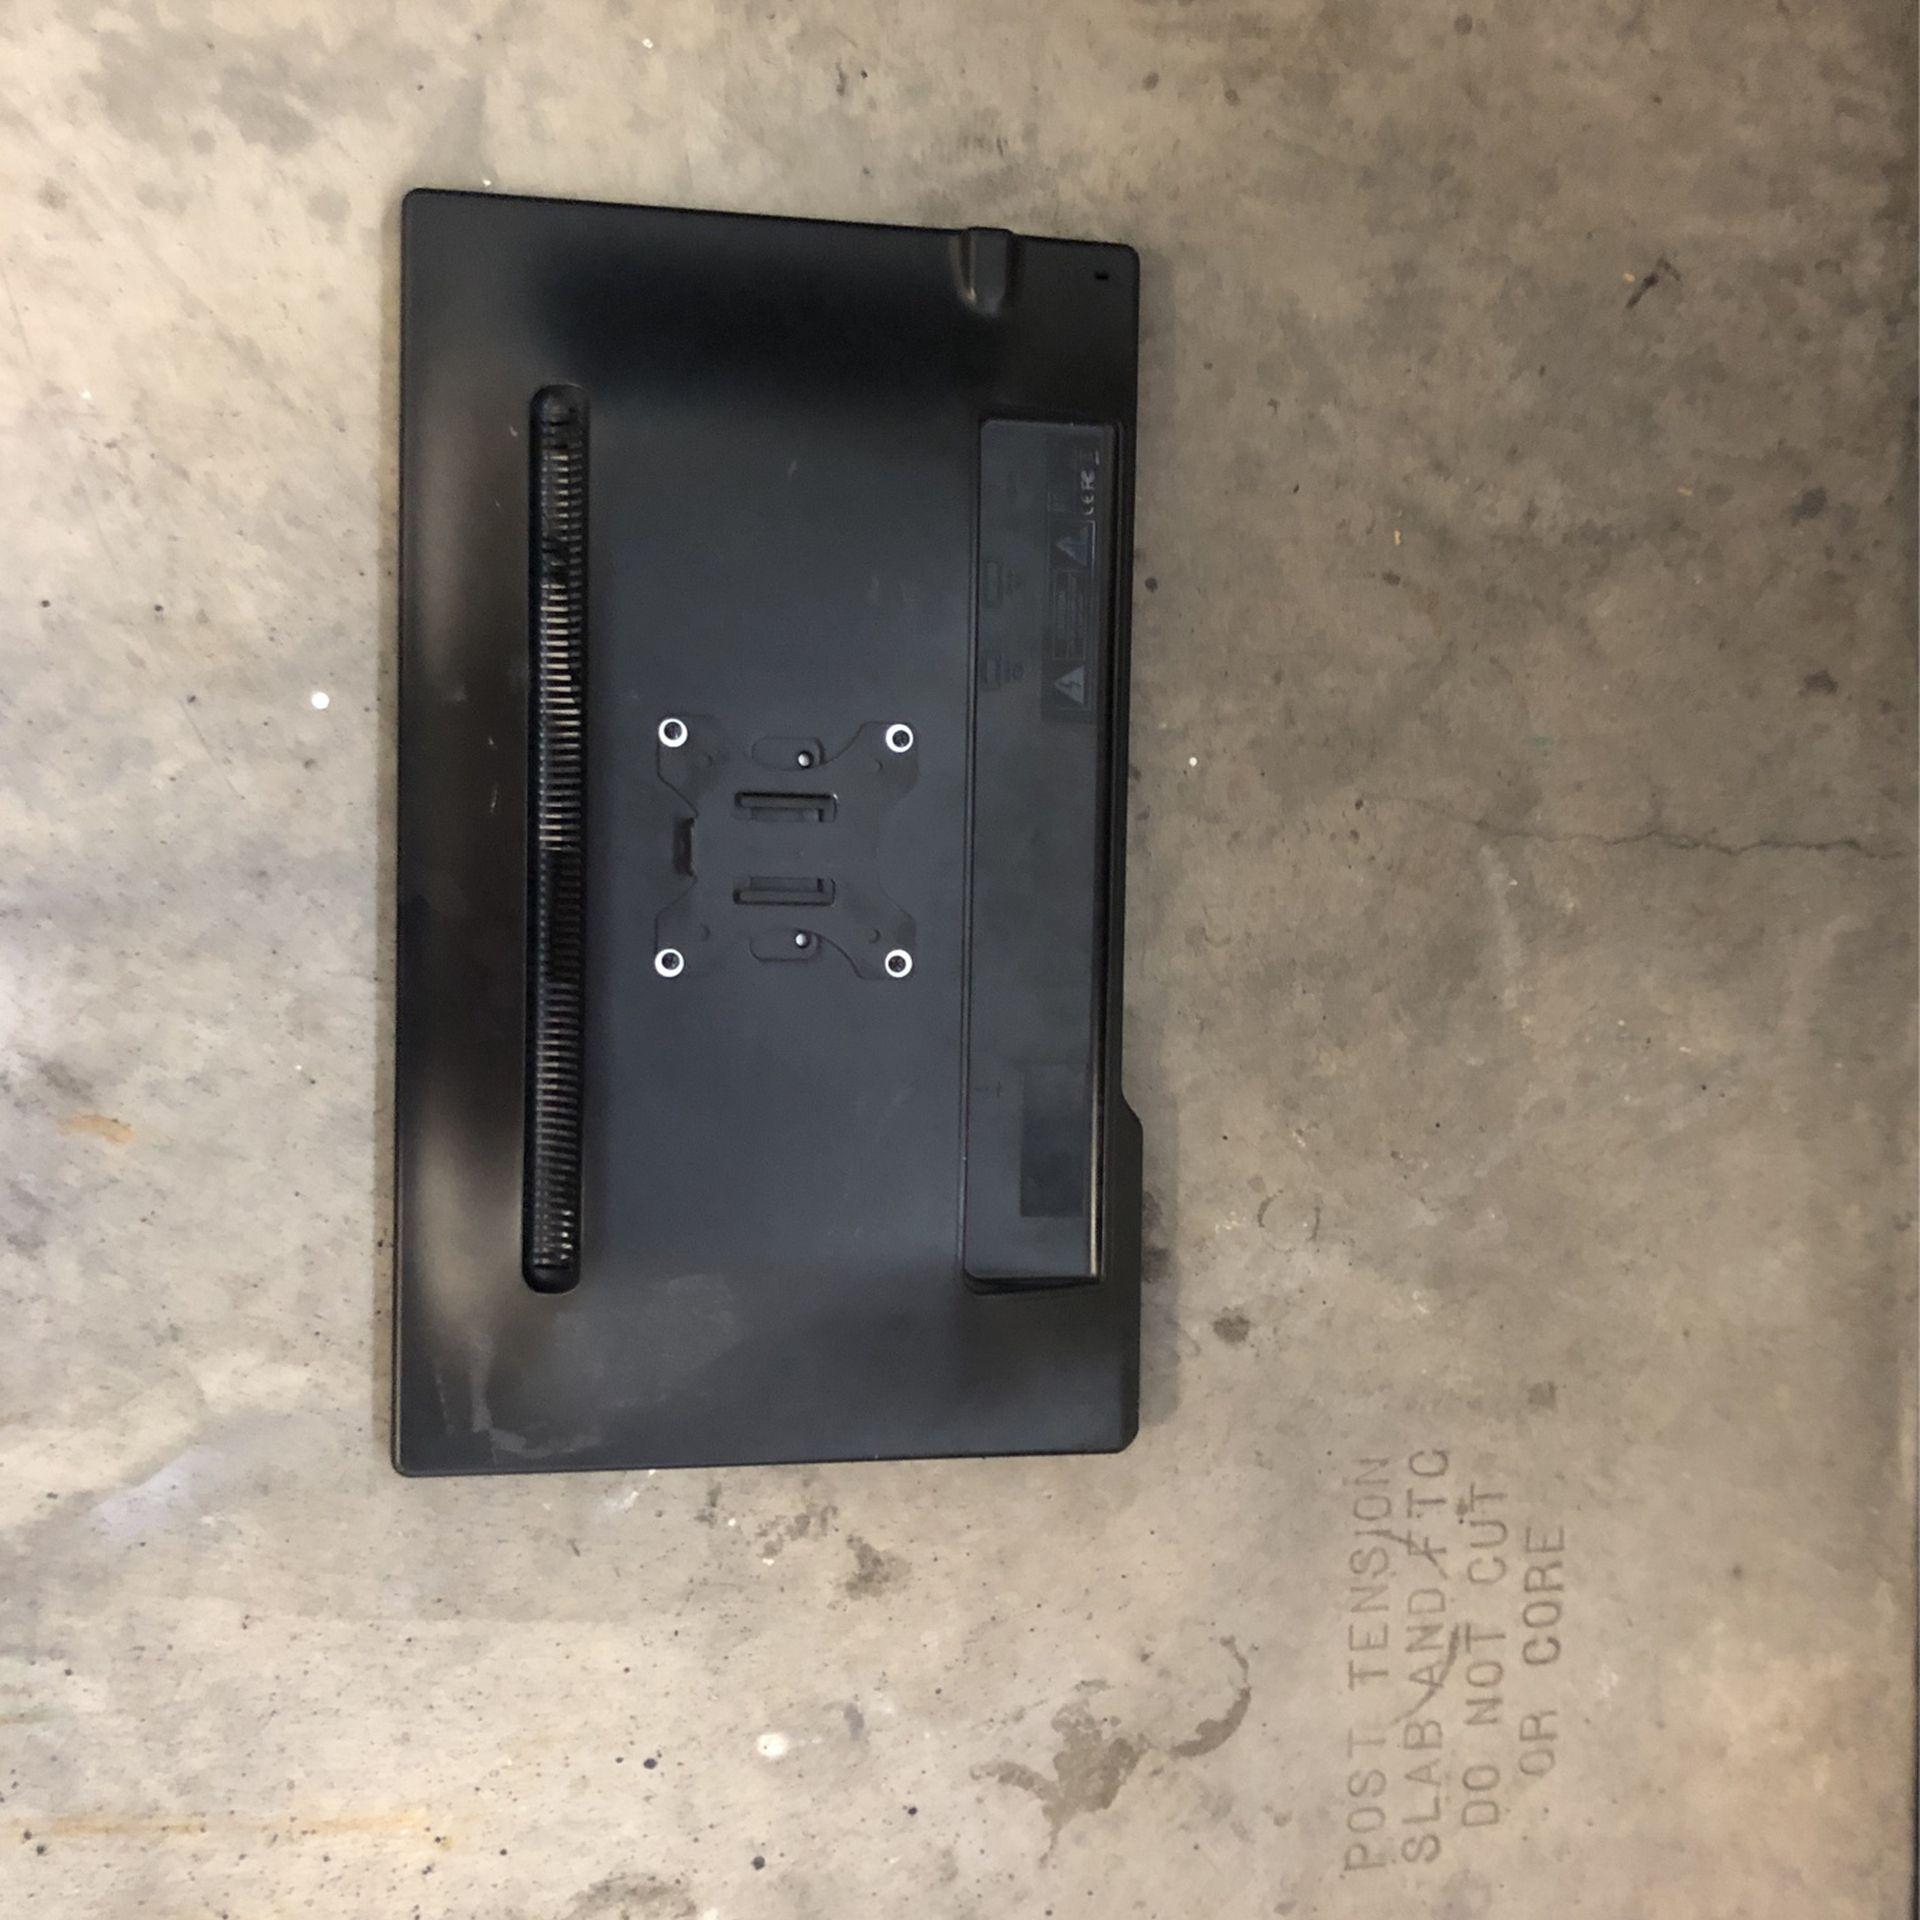 2 Benq Monitors